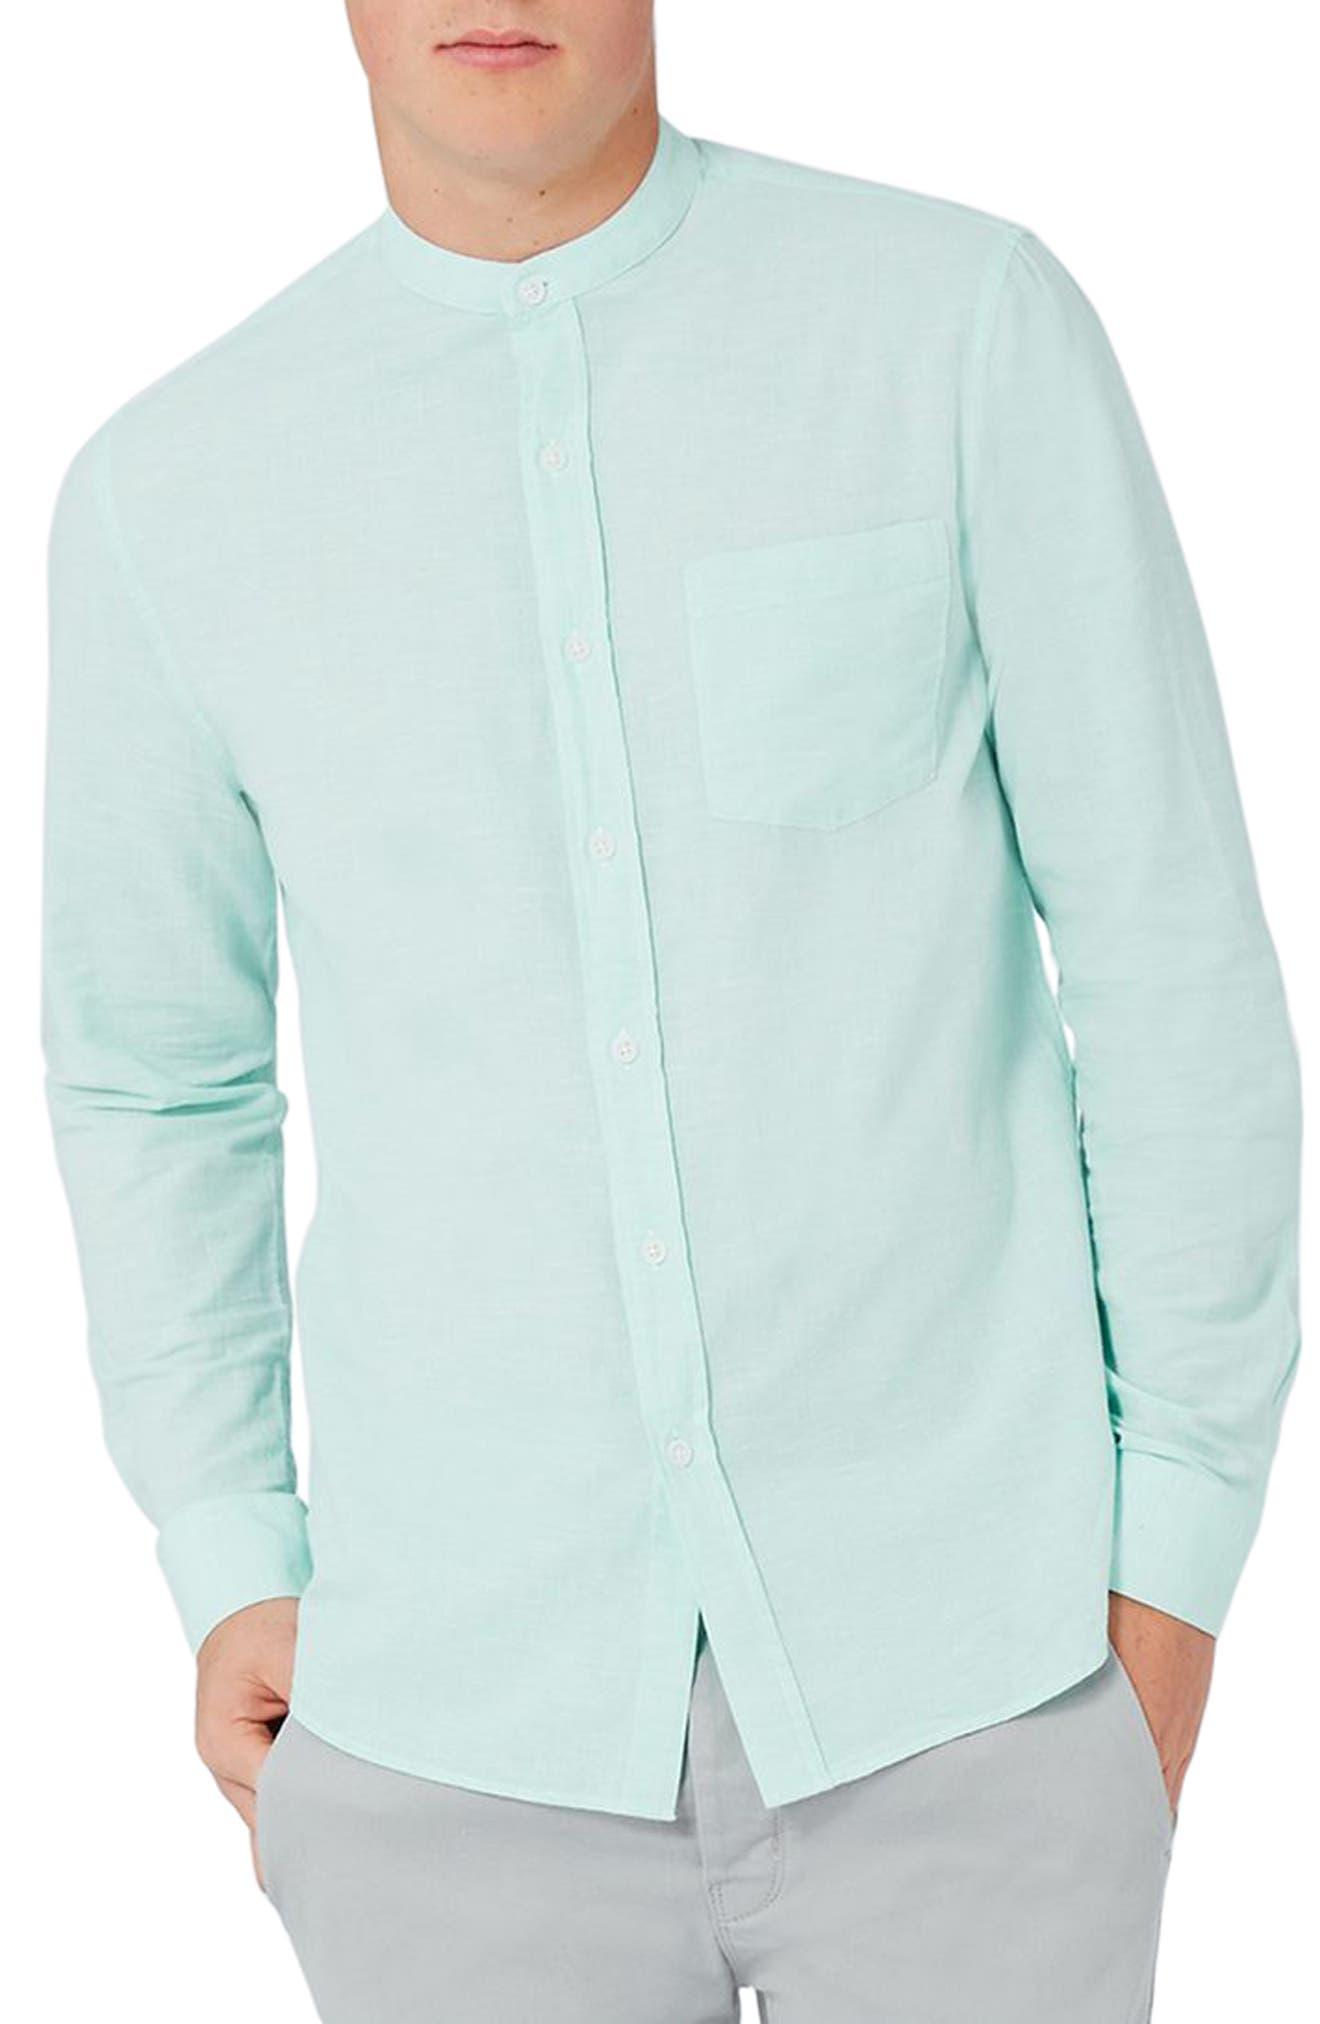 Topman Band Collar Slub Woven Shirt